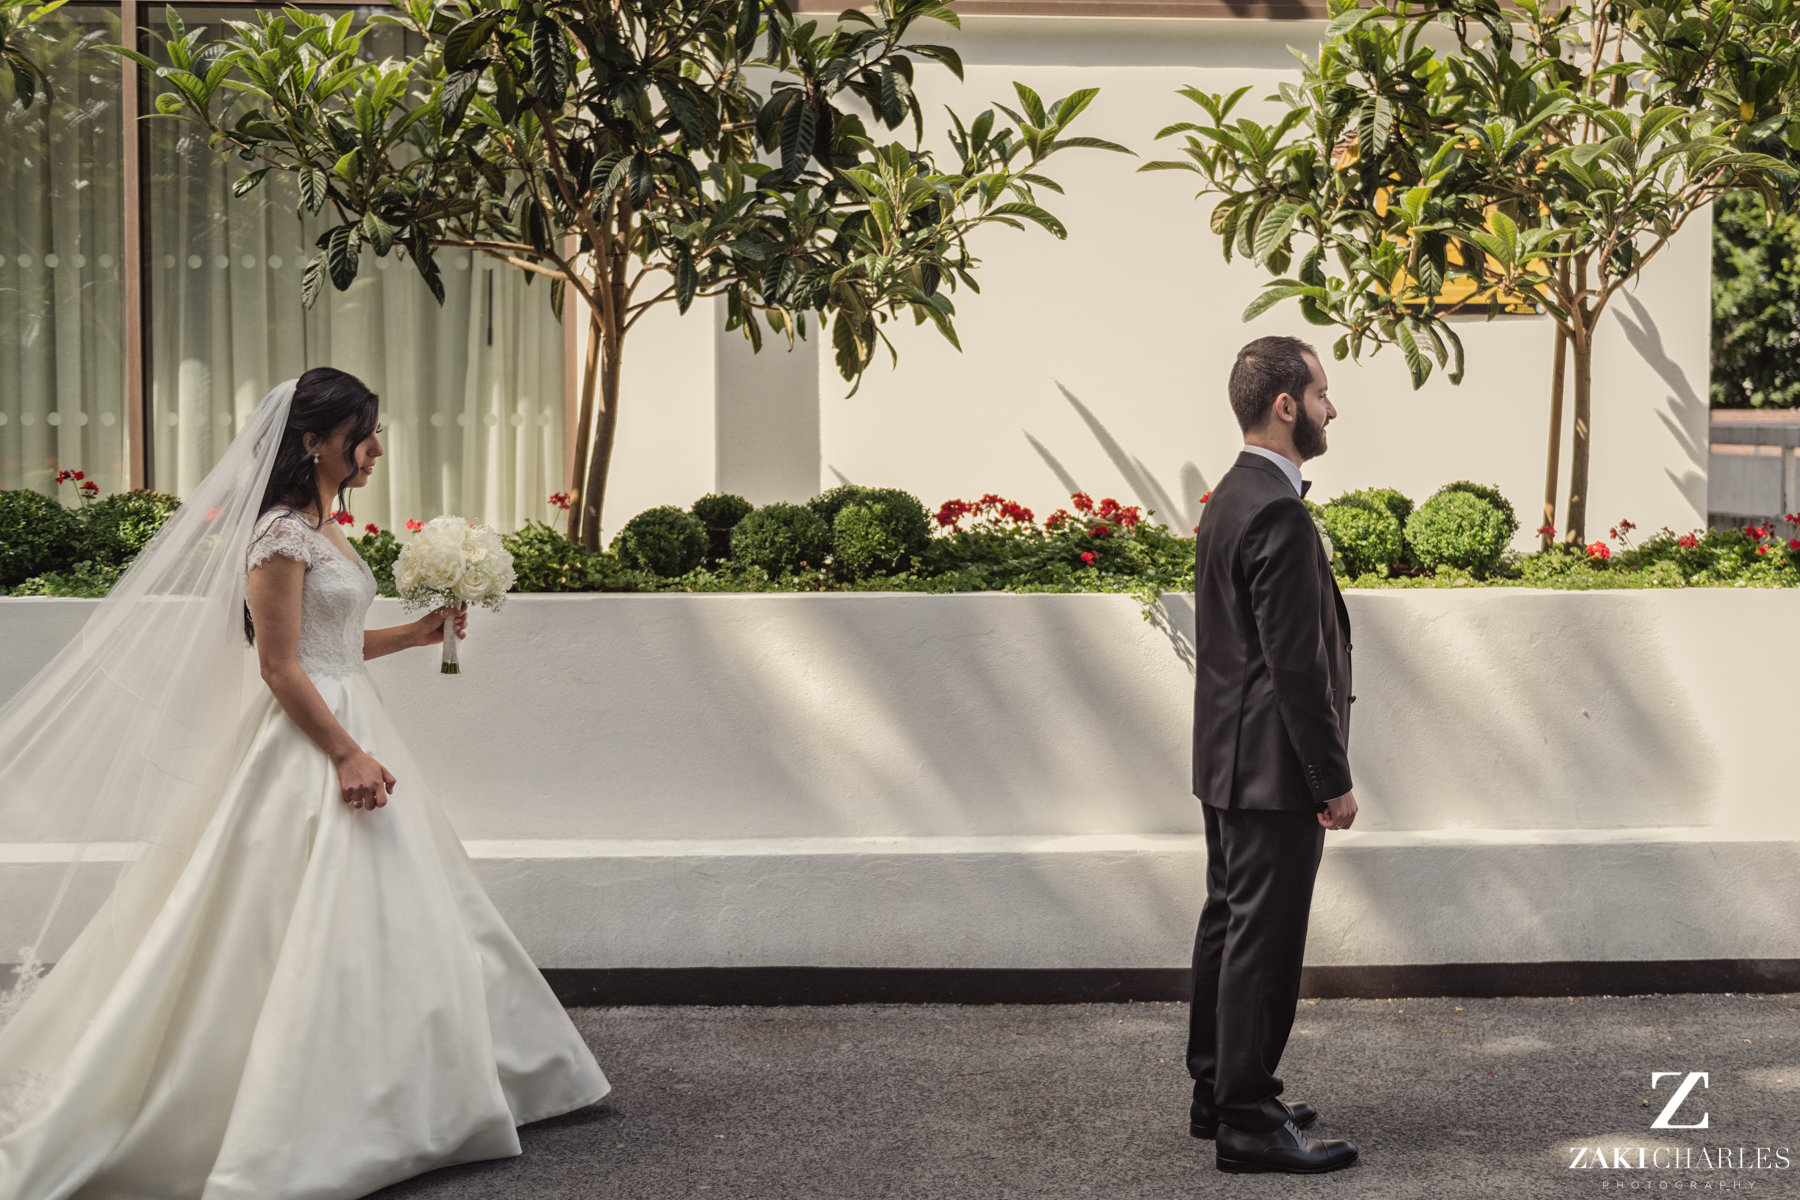 First look between Bride and Groom 4